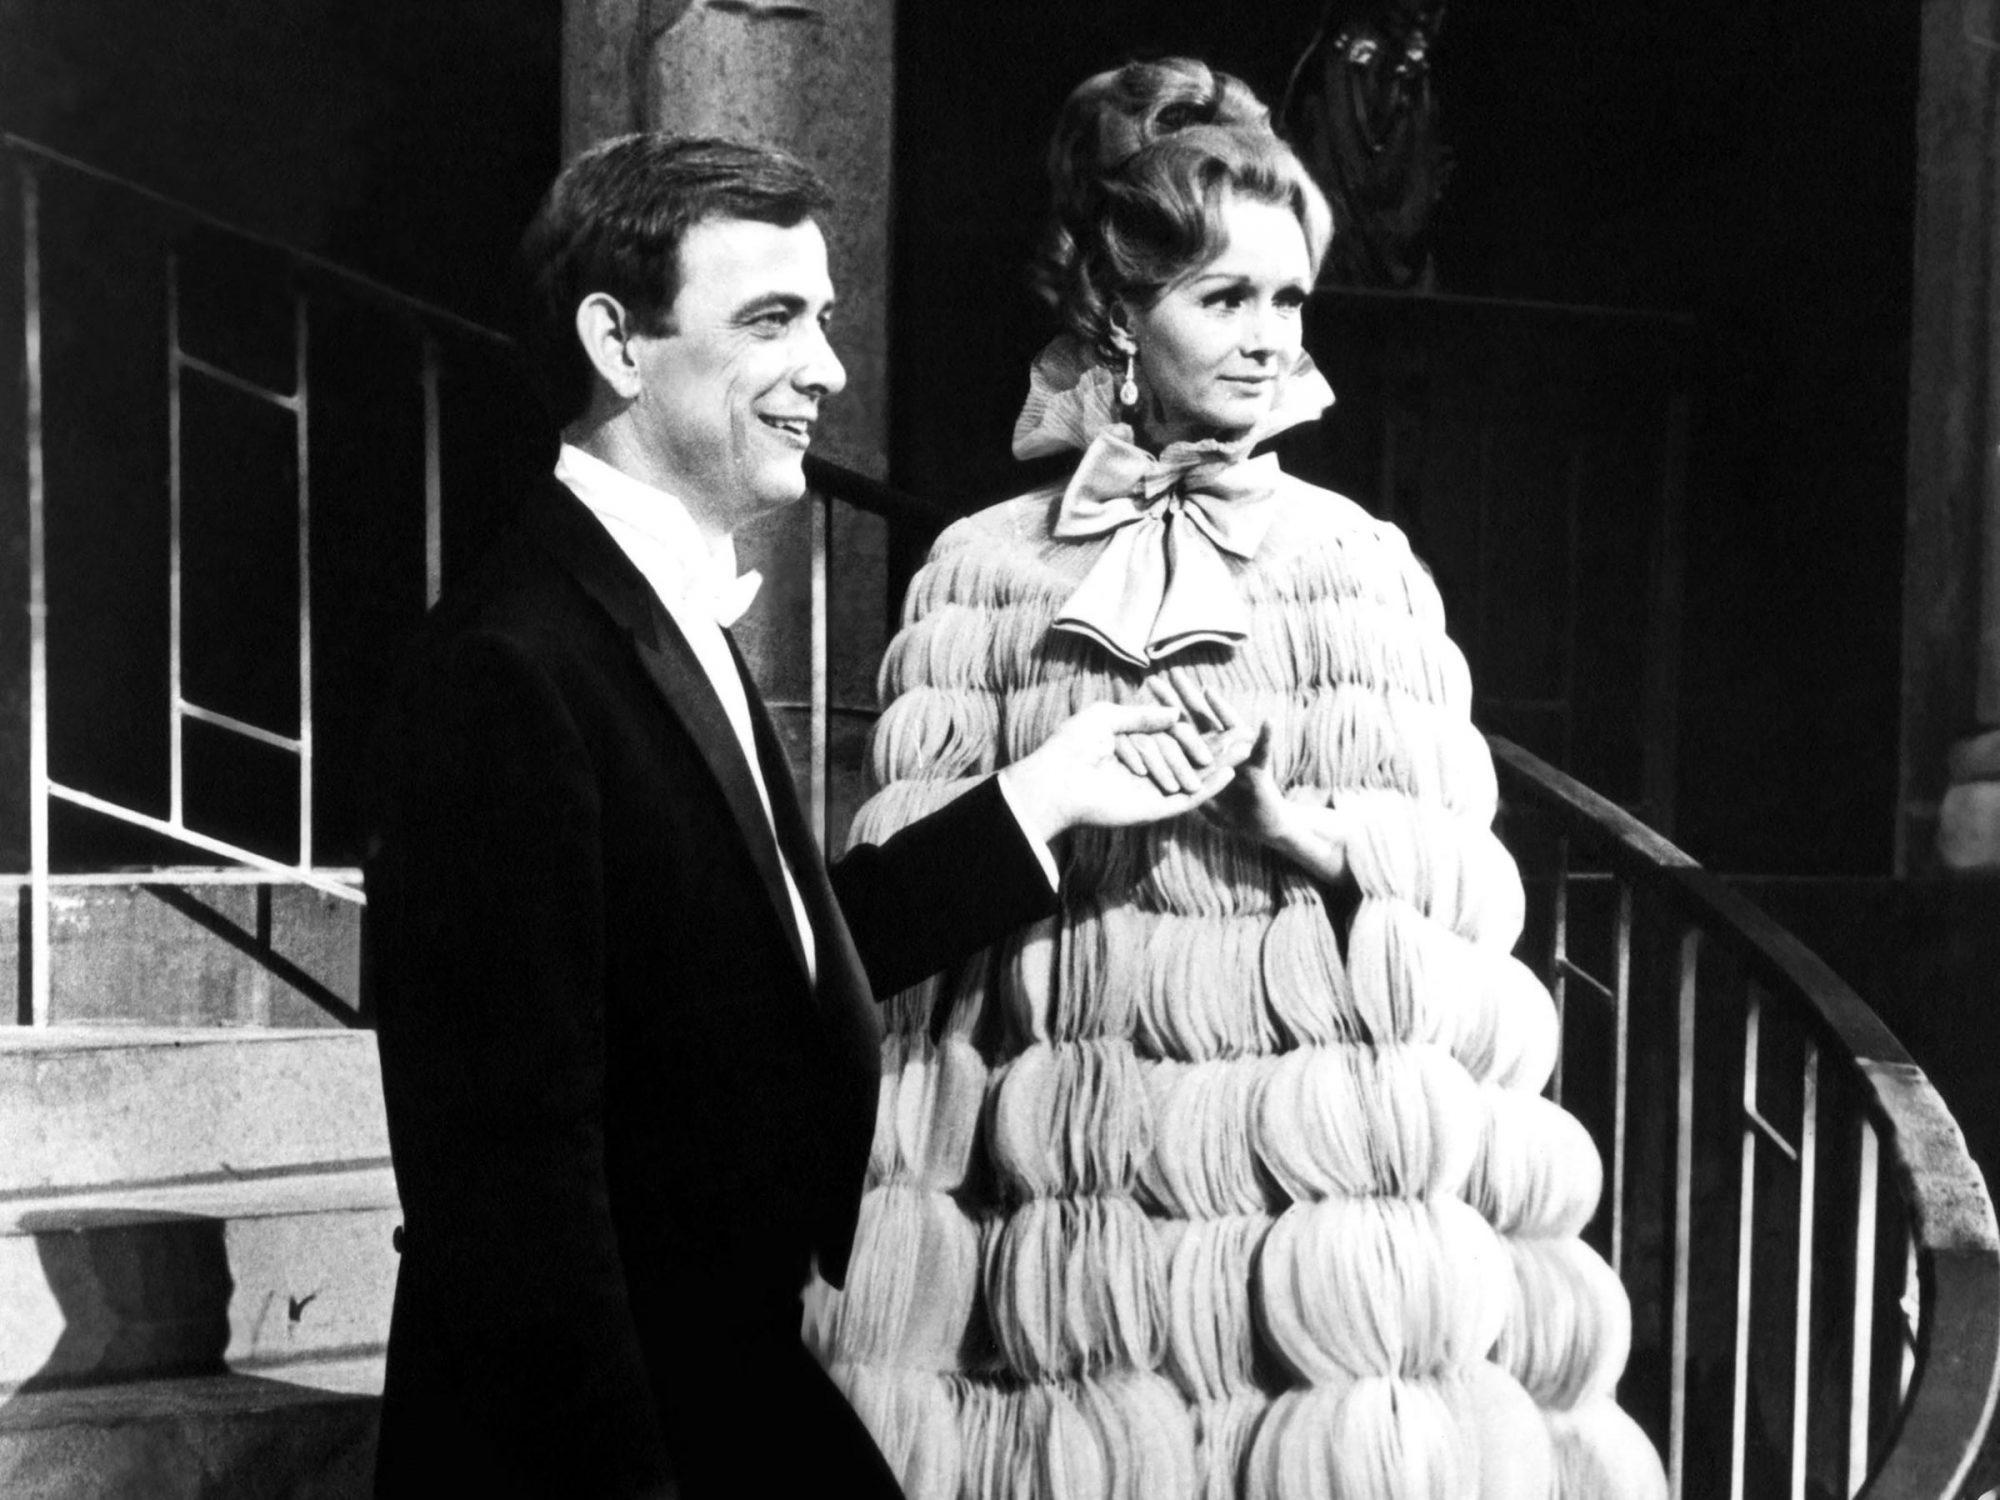 IRENE, Monte Markham, Debbie Reynolds, Minskoff Theater, New York, 1973-1974